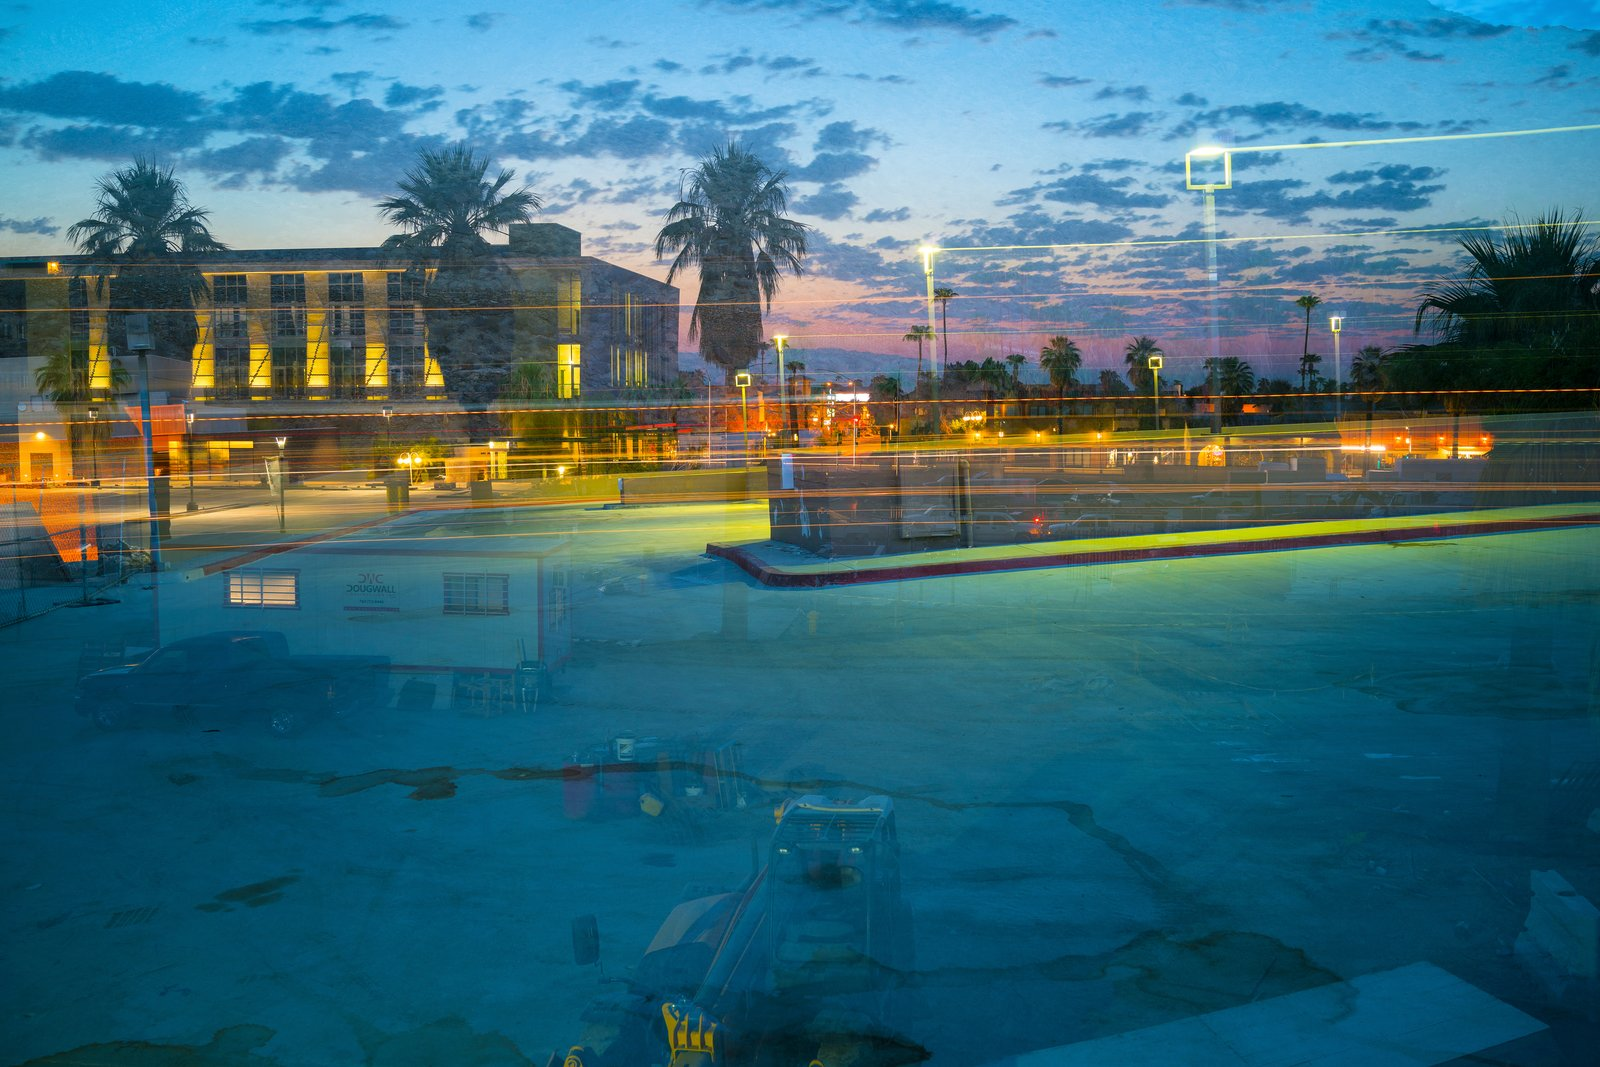 Palm Springs, California, Friday, August 26, 2016 at 6:38 AM   fredfehlau.com